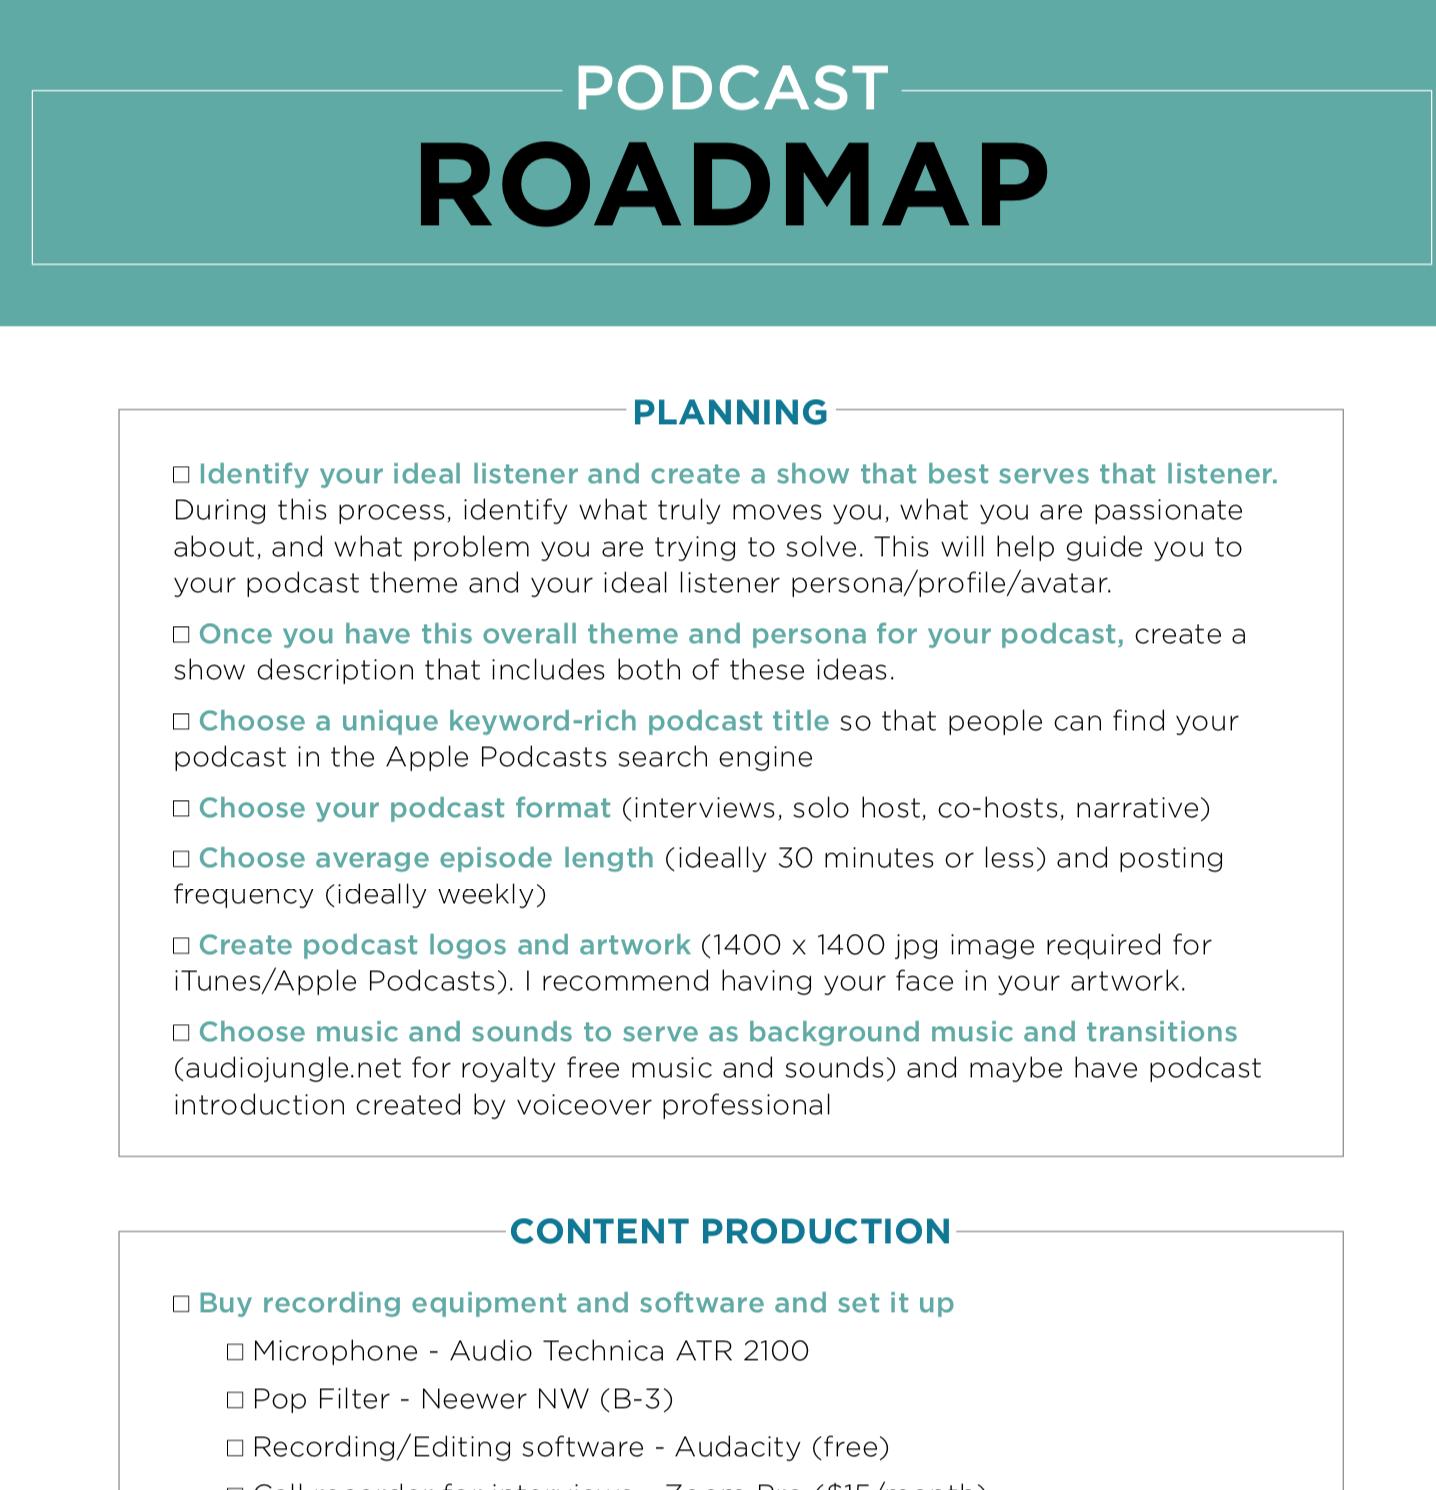 Podcast Roadmap